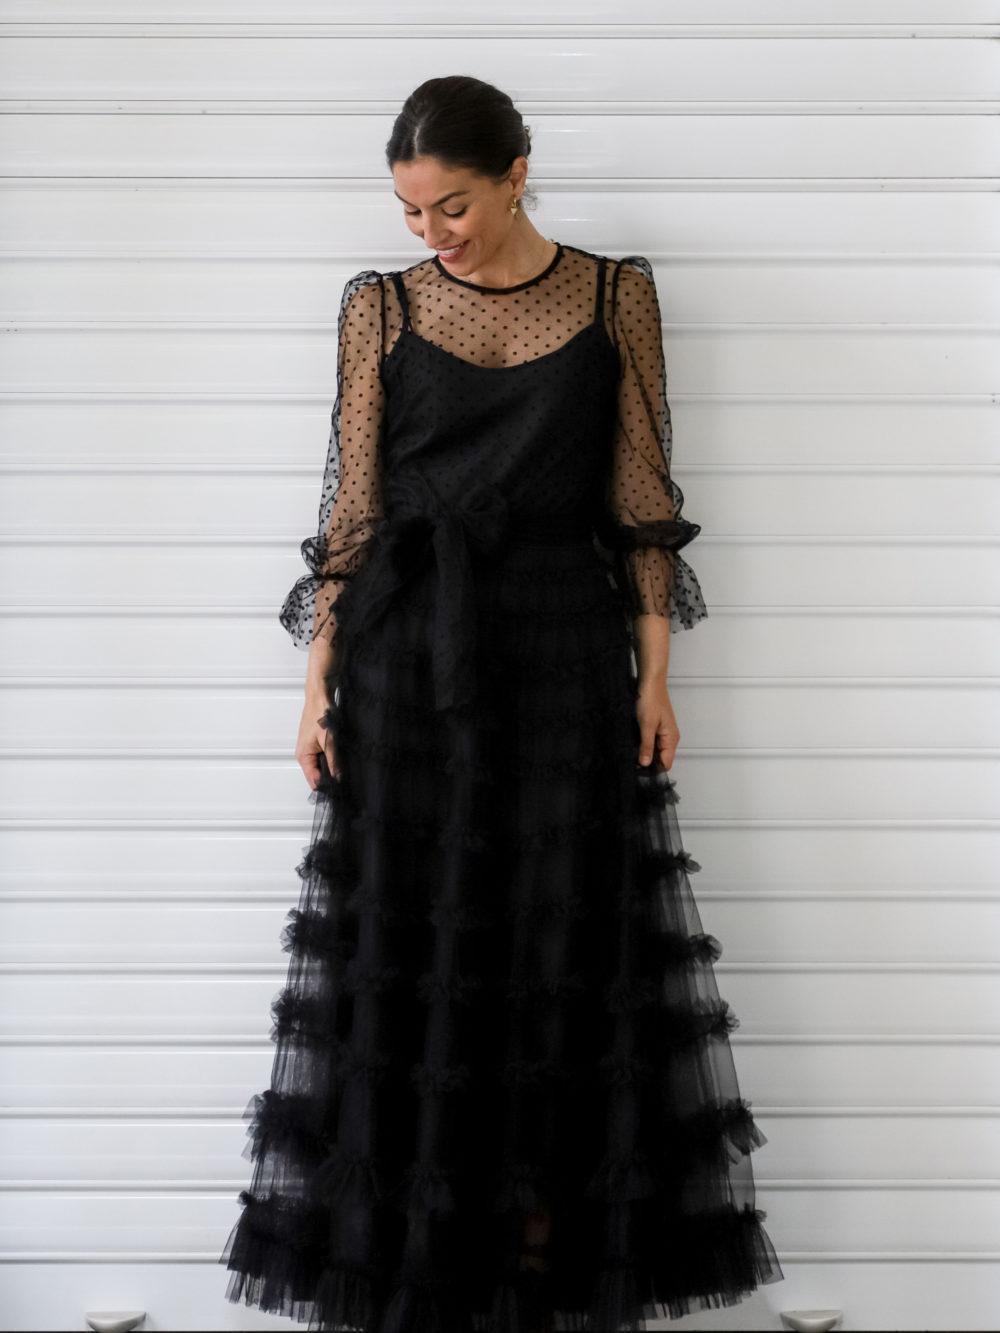 Look I love black